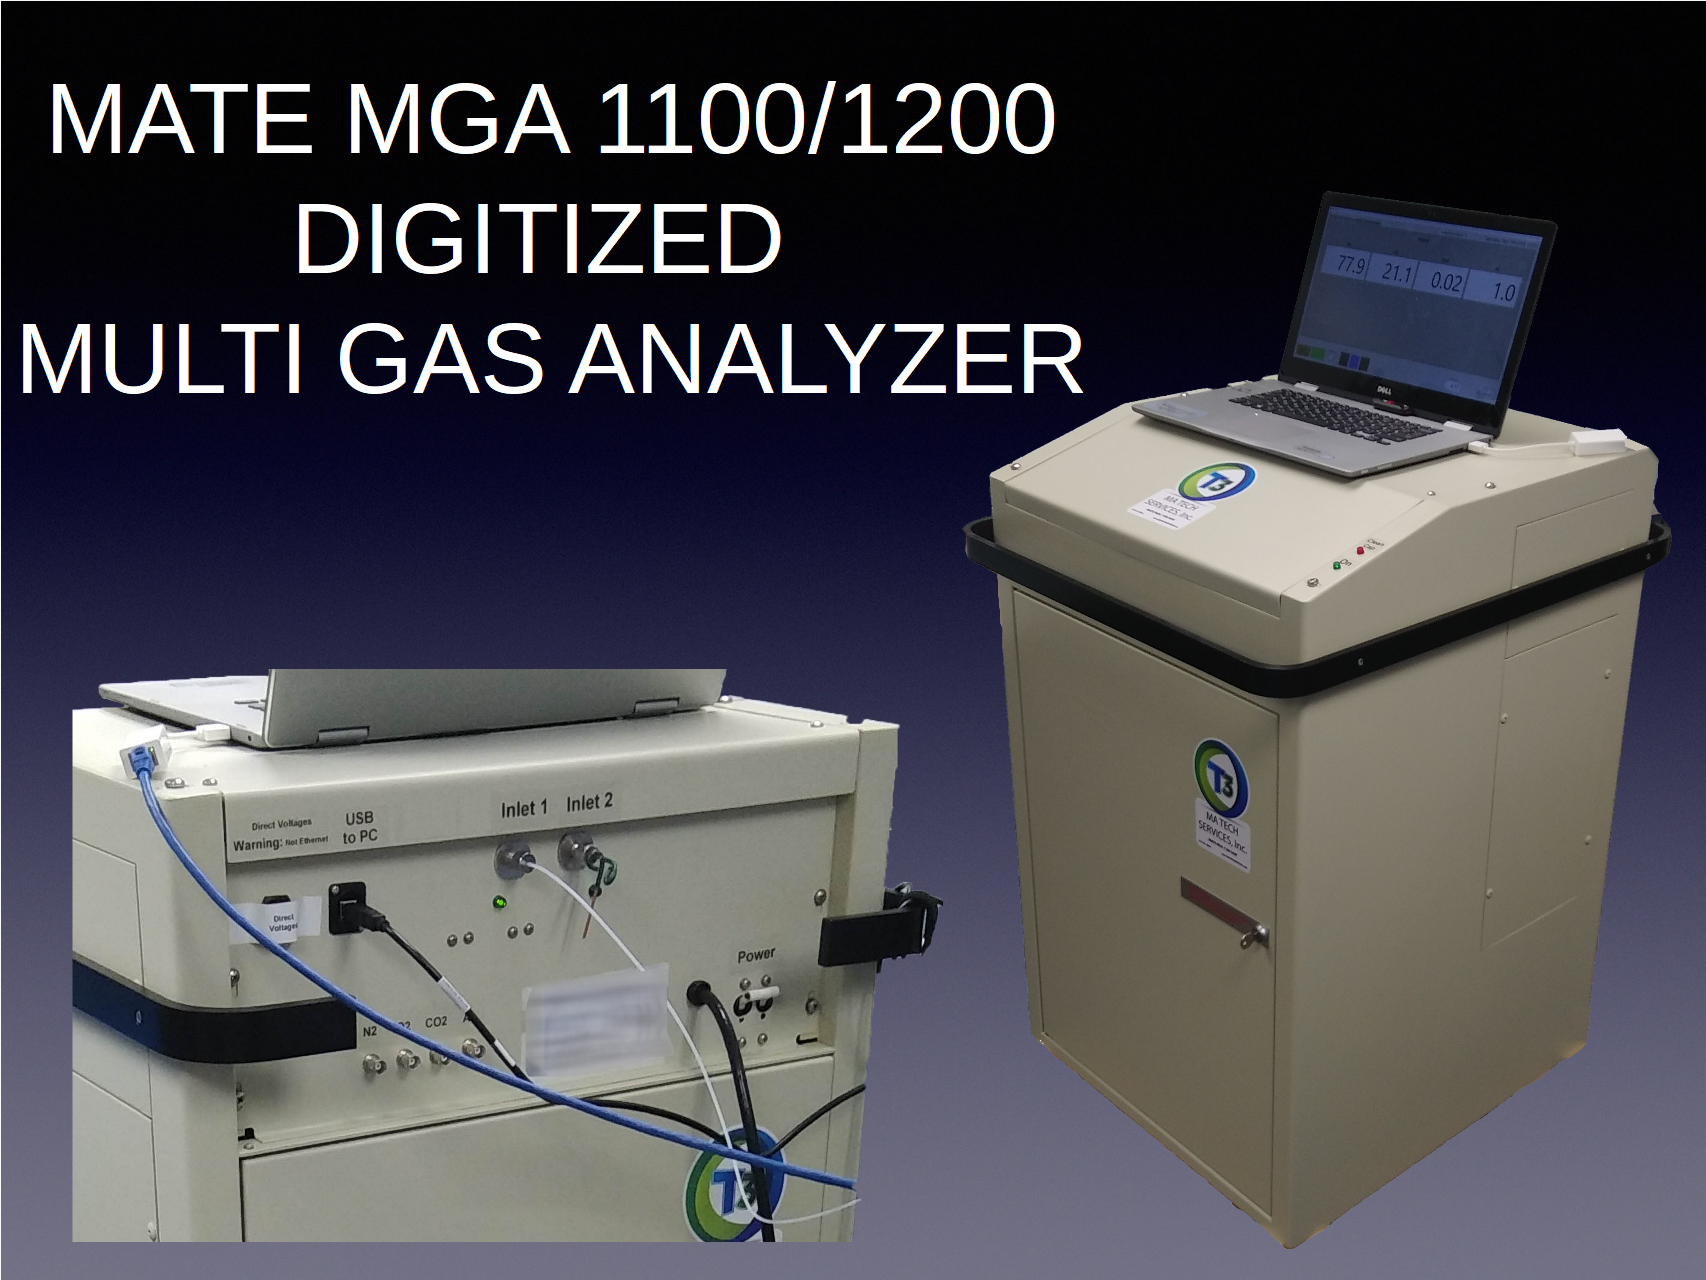 MATE MGA 1100